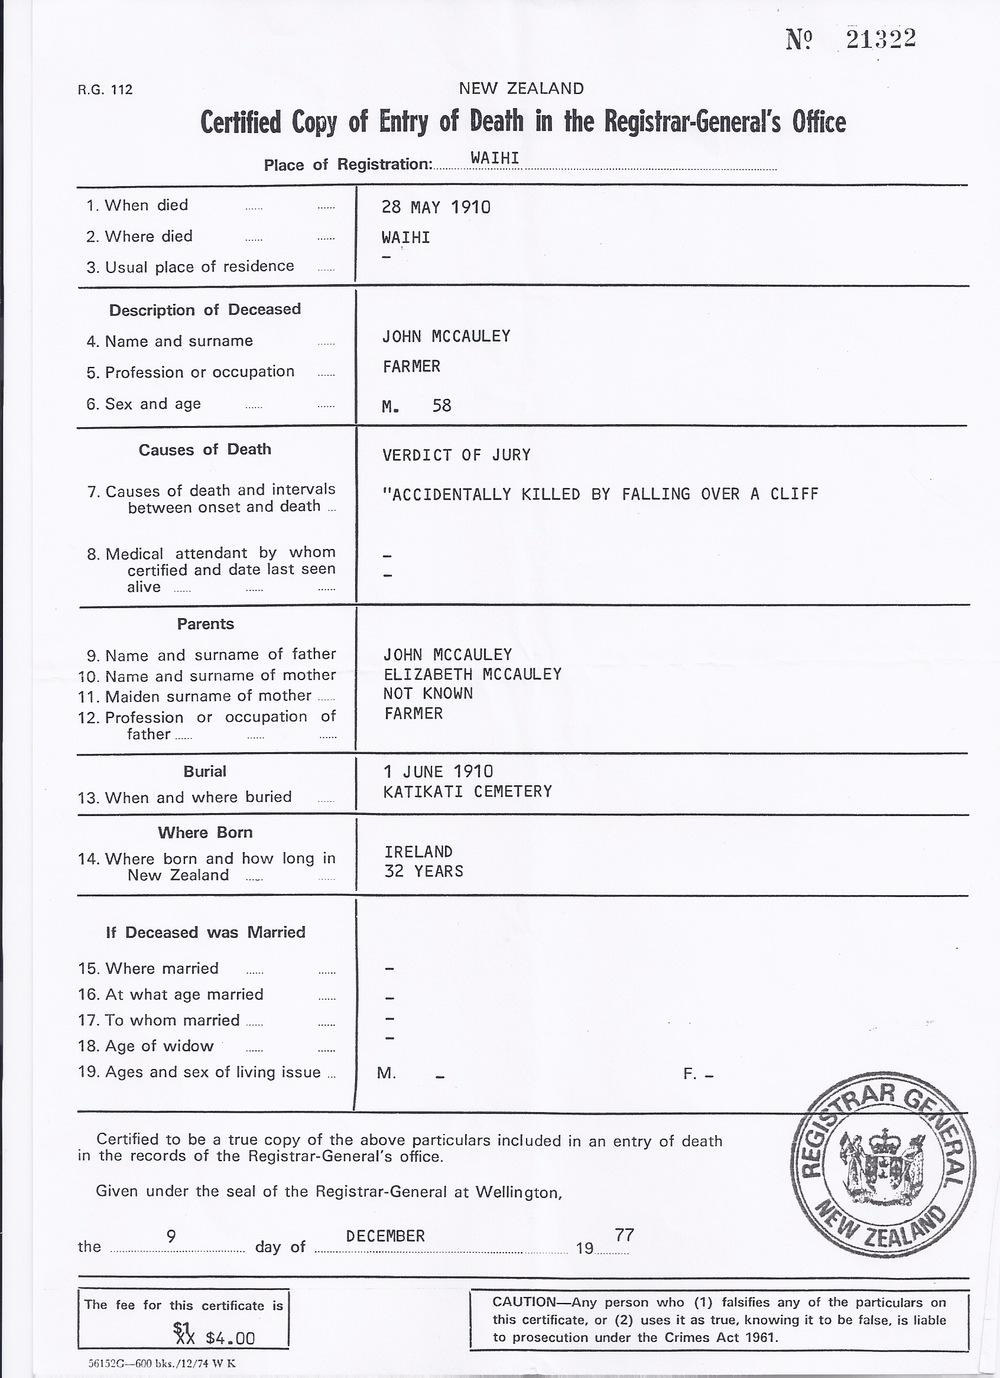 John Jnr. McCauley's Death Certificate